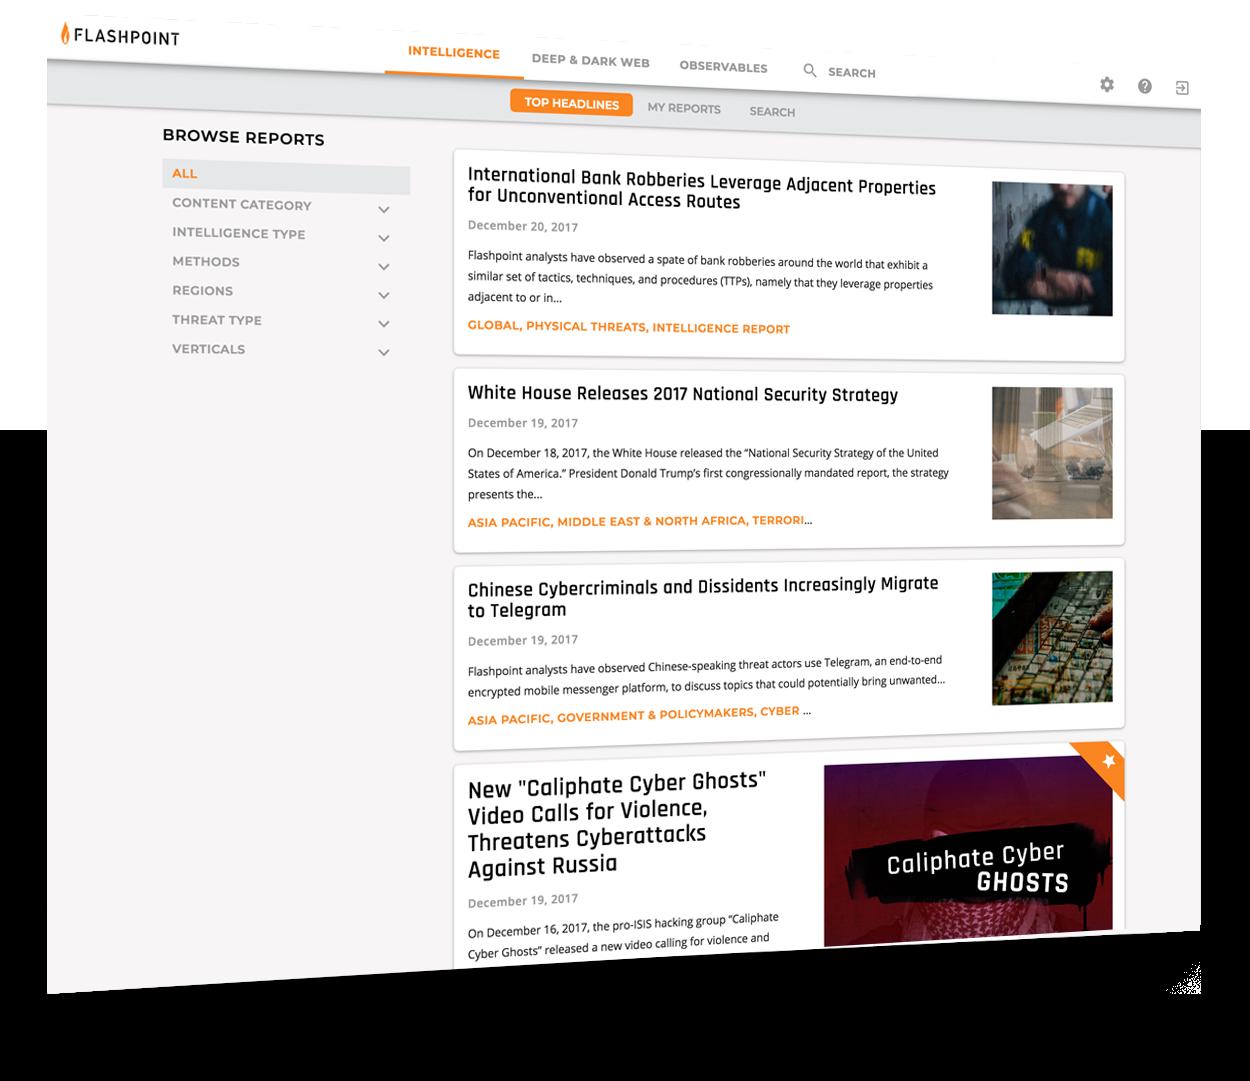 Flashpoint Intelligence Platform